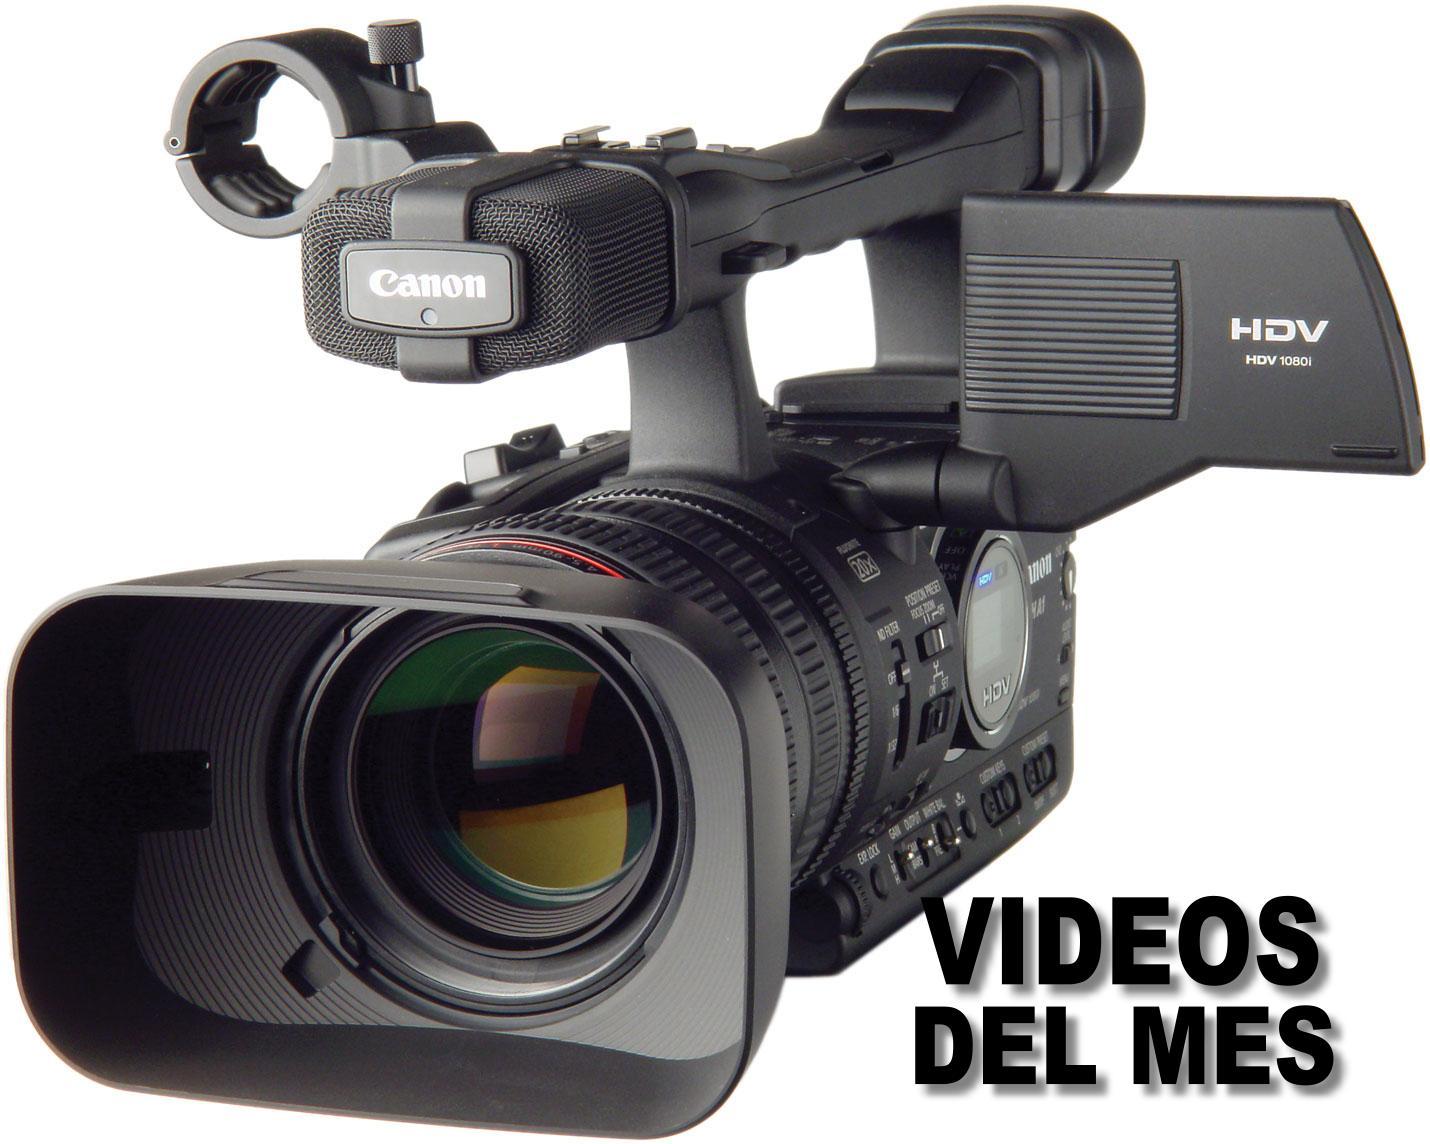 VIDEOMES